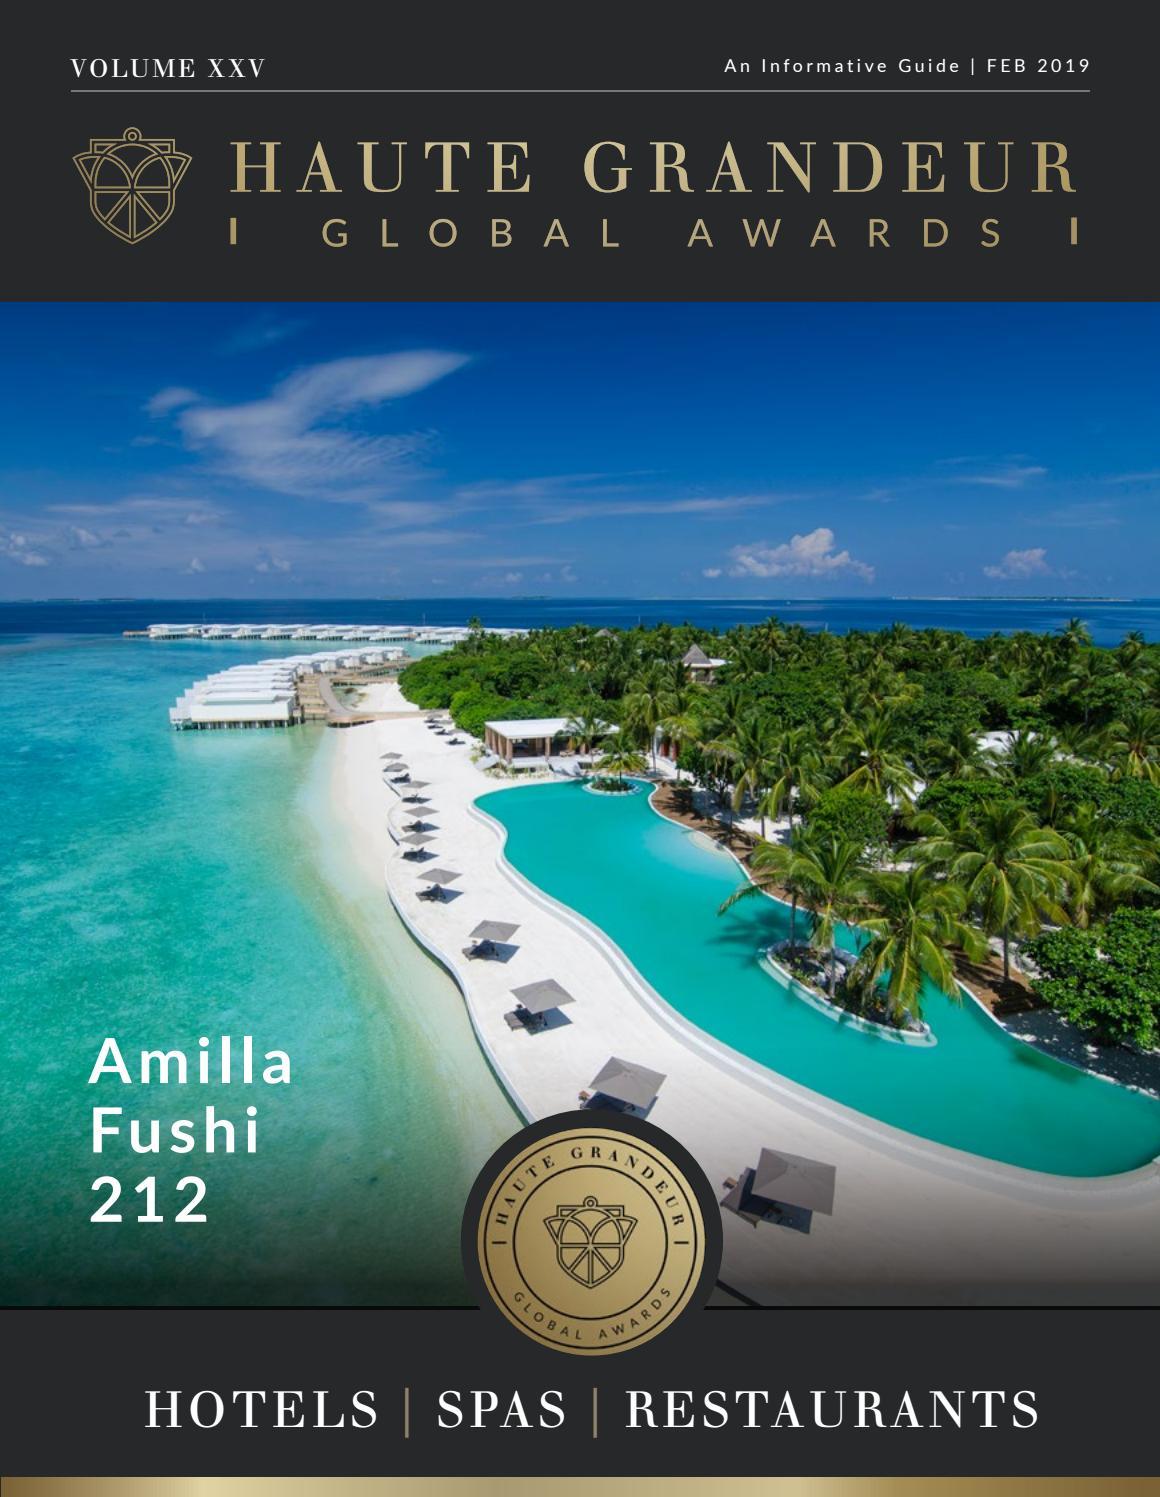 Haute Grandeur, The Best in Hotels, Spas and Restaurants